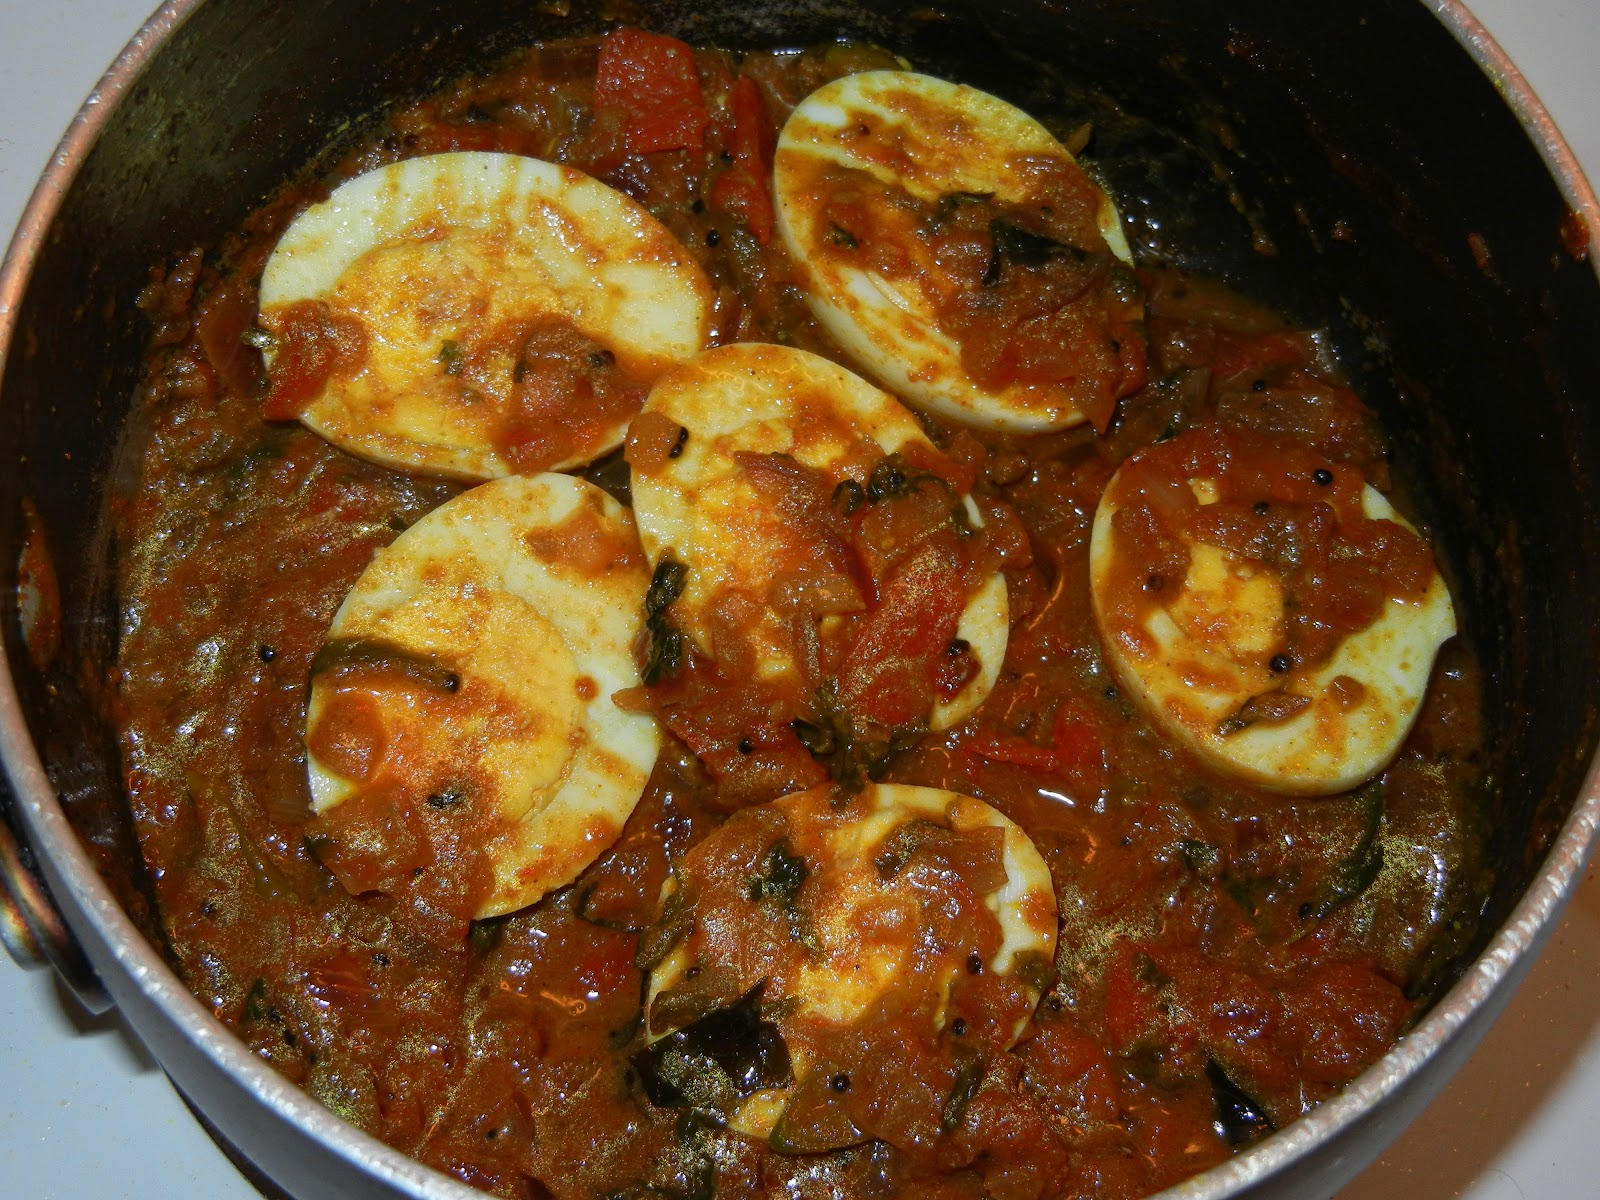 Yashodha's kitchen: QUICK EGG CURRY